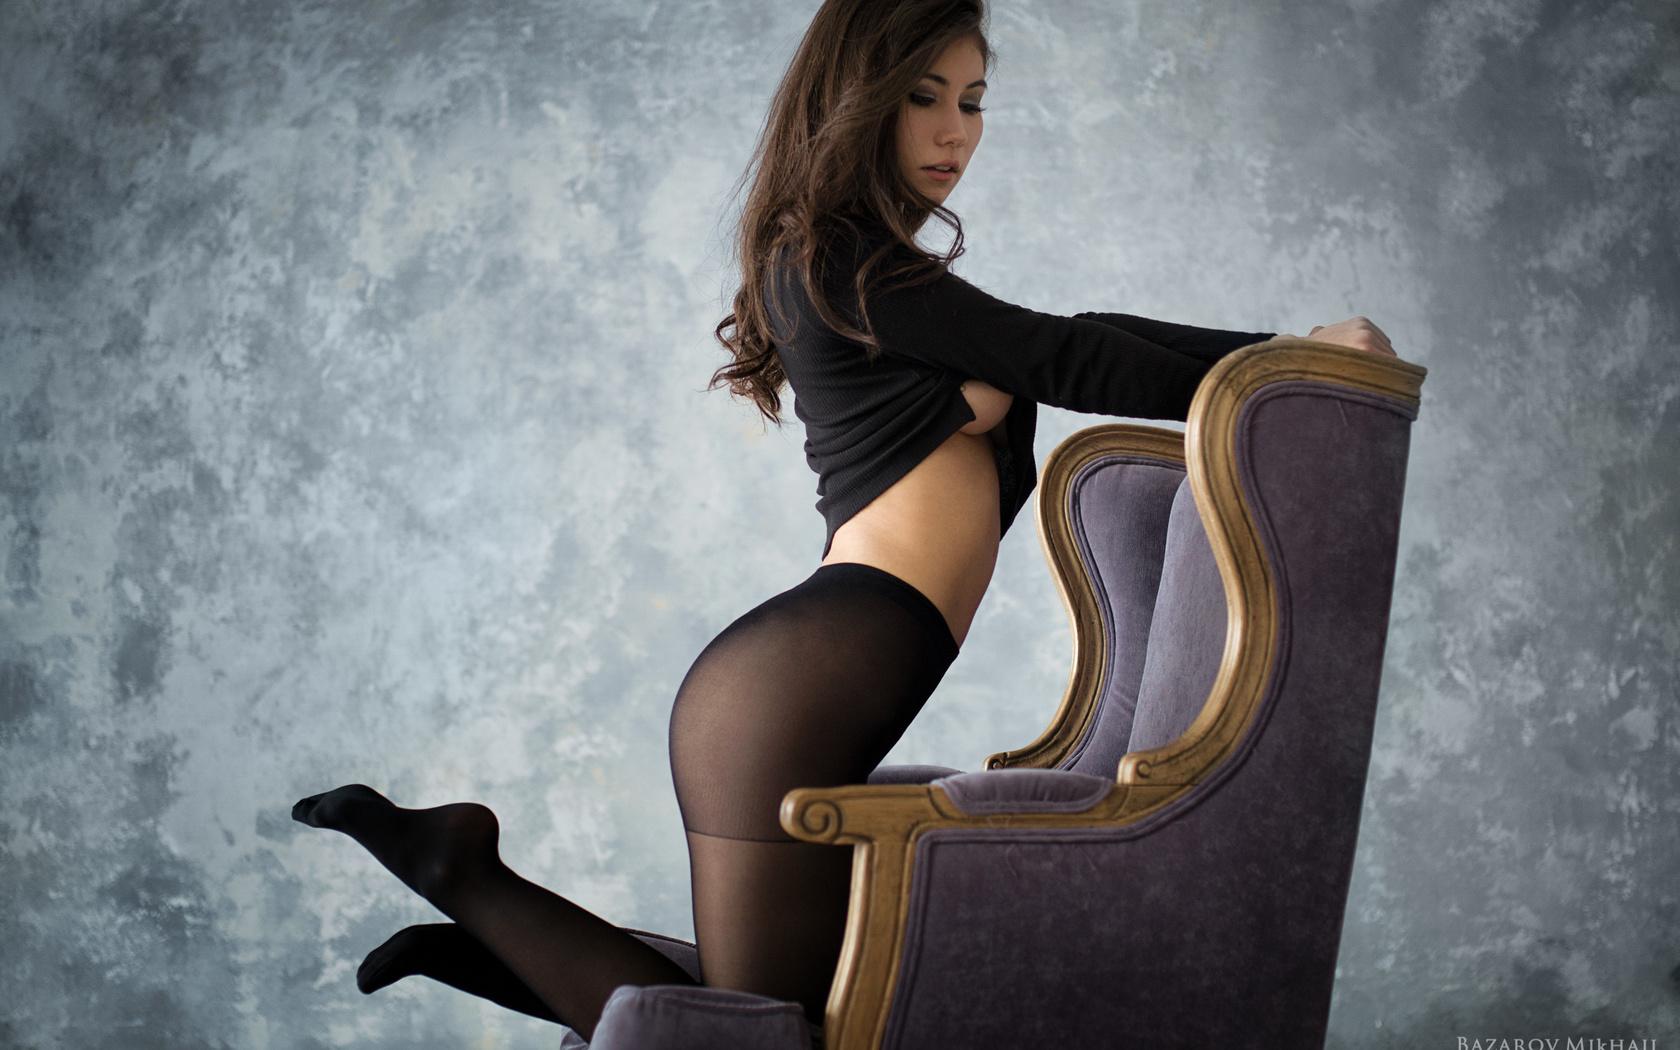 Раб на коленях, Раб на коленях трахает молодую хозяйку страпоном на 27 фотография